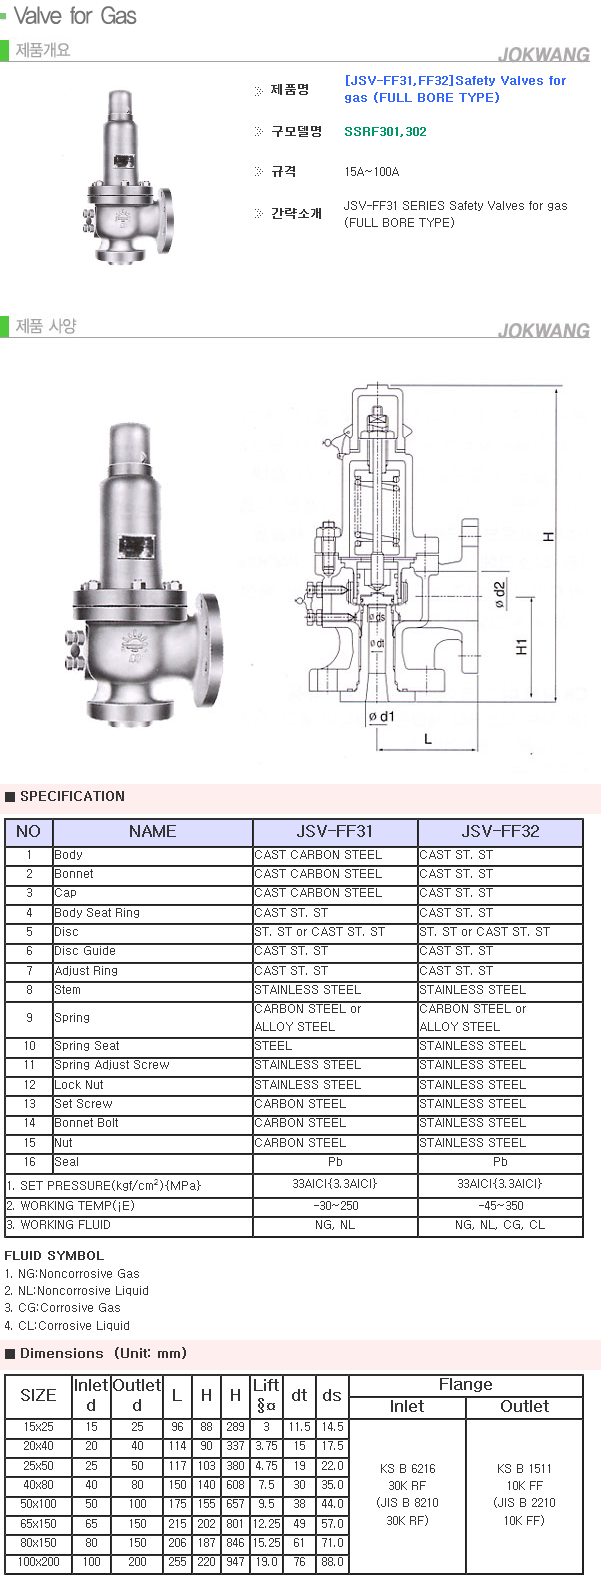 Jokwang ILI Safety Valves (Full Bore Type) JSV-FF31/FF32